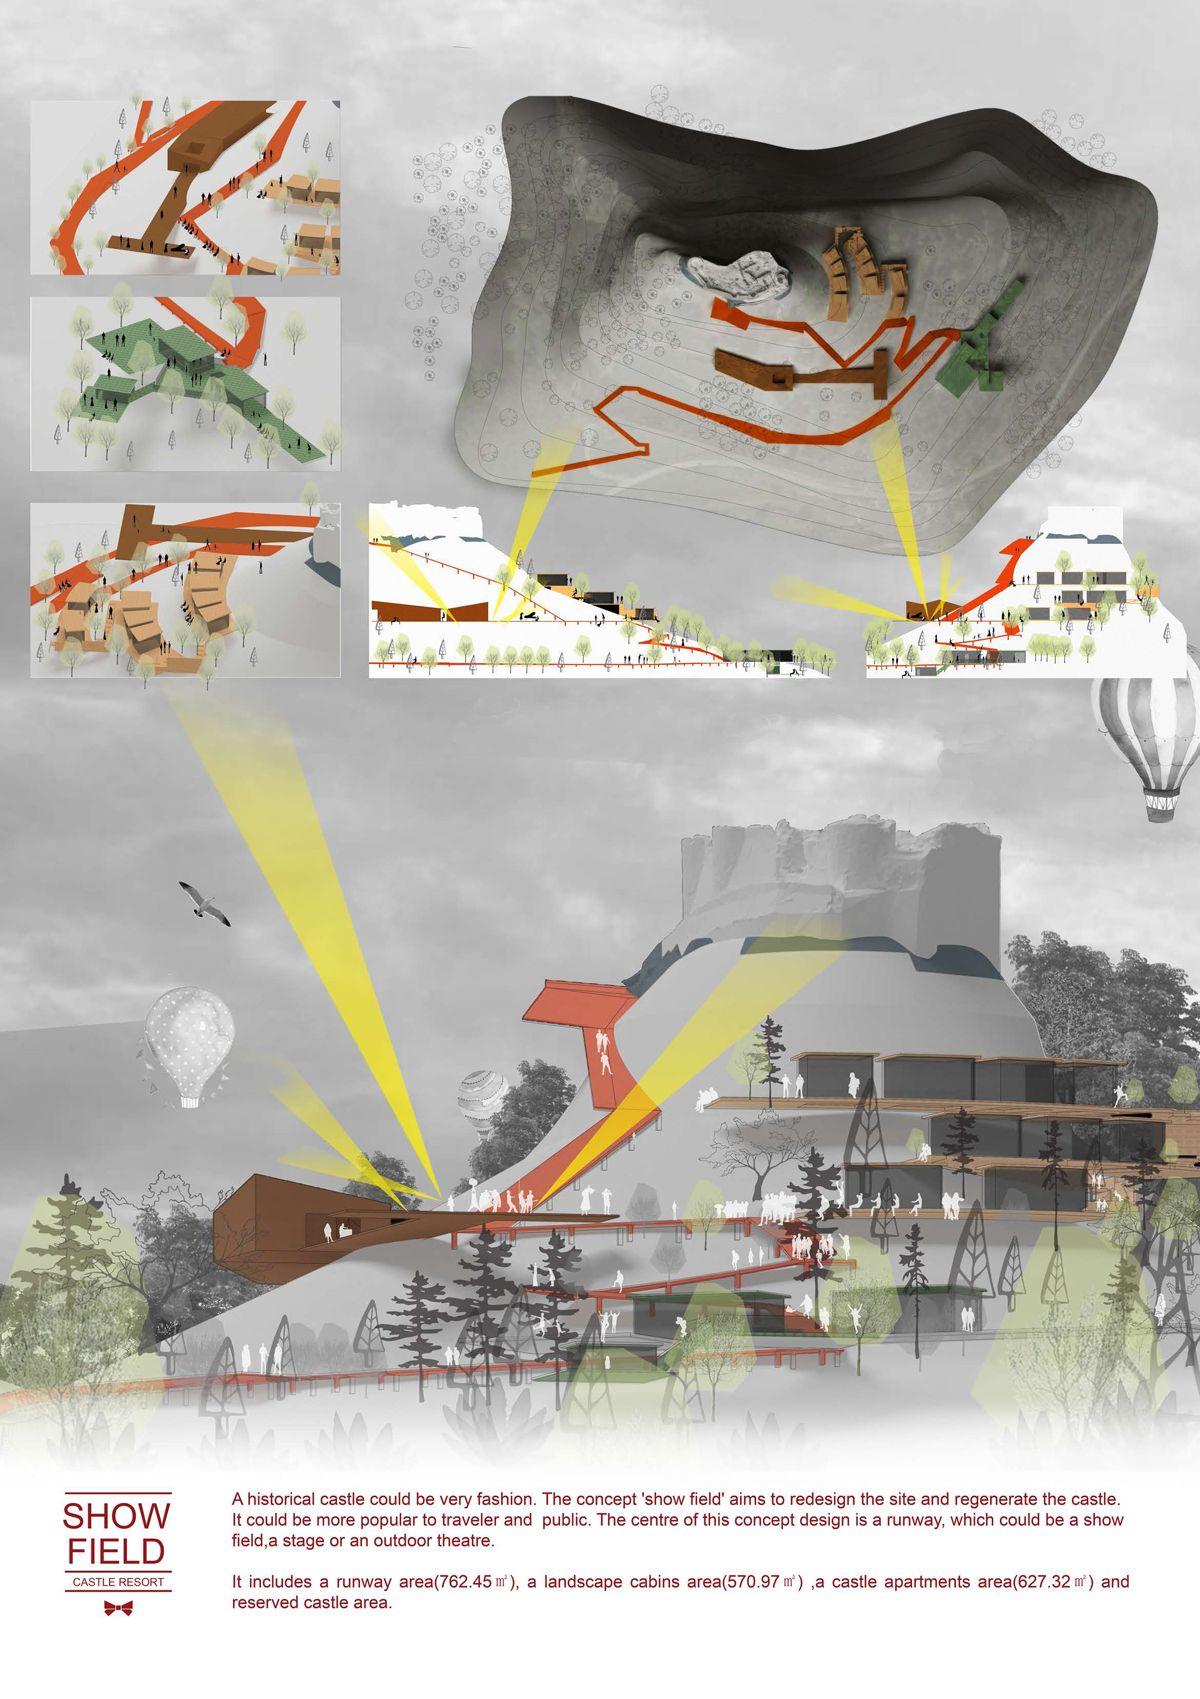 ID Team:10897 - Snowdrop Landscape Studio (ZEHAO HU, RUI BAI,  BOHAN OU, LU LU) -China